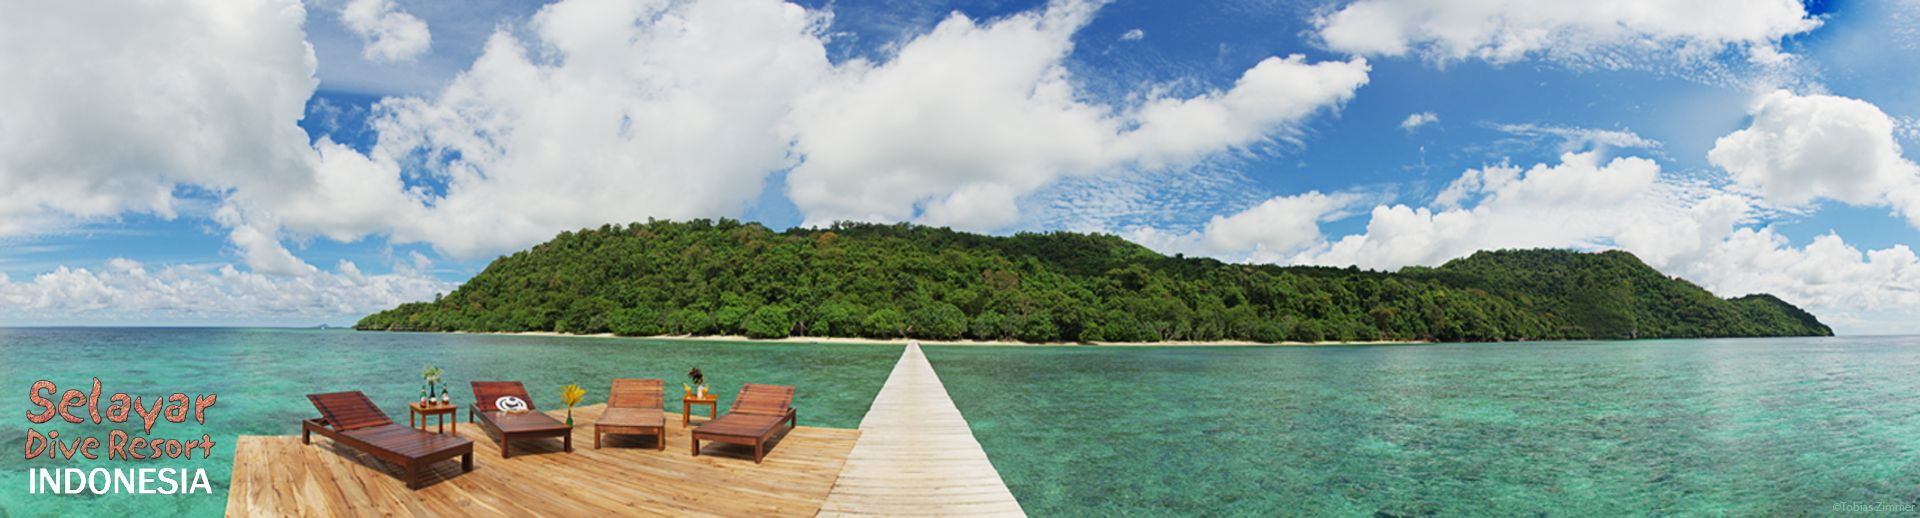 strand indonesien pier selayar dive resort